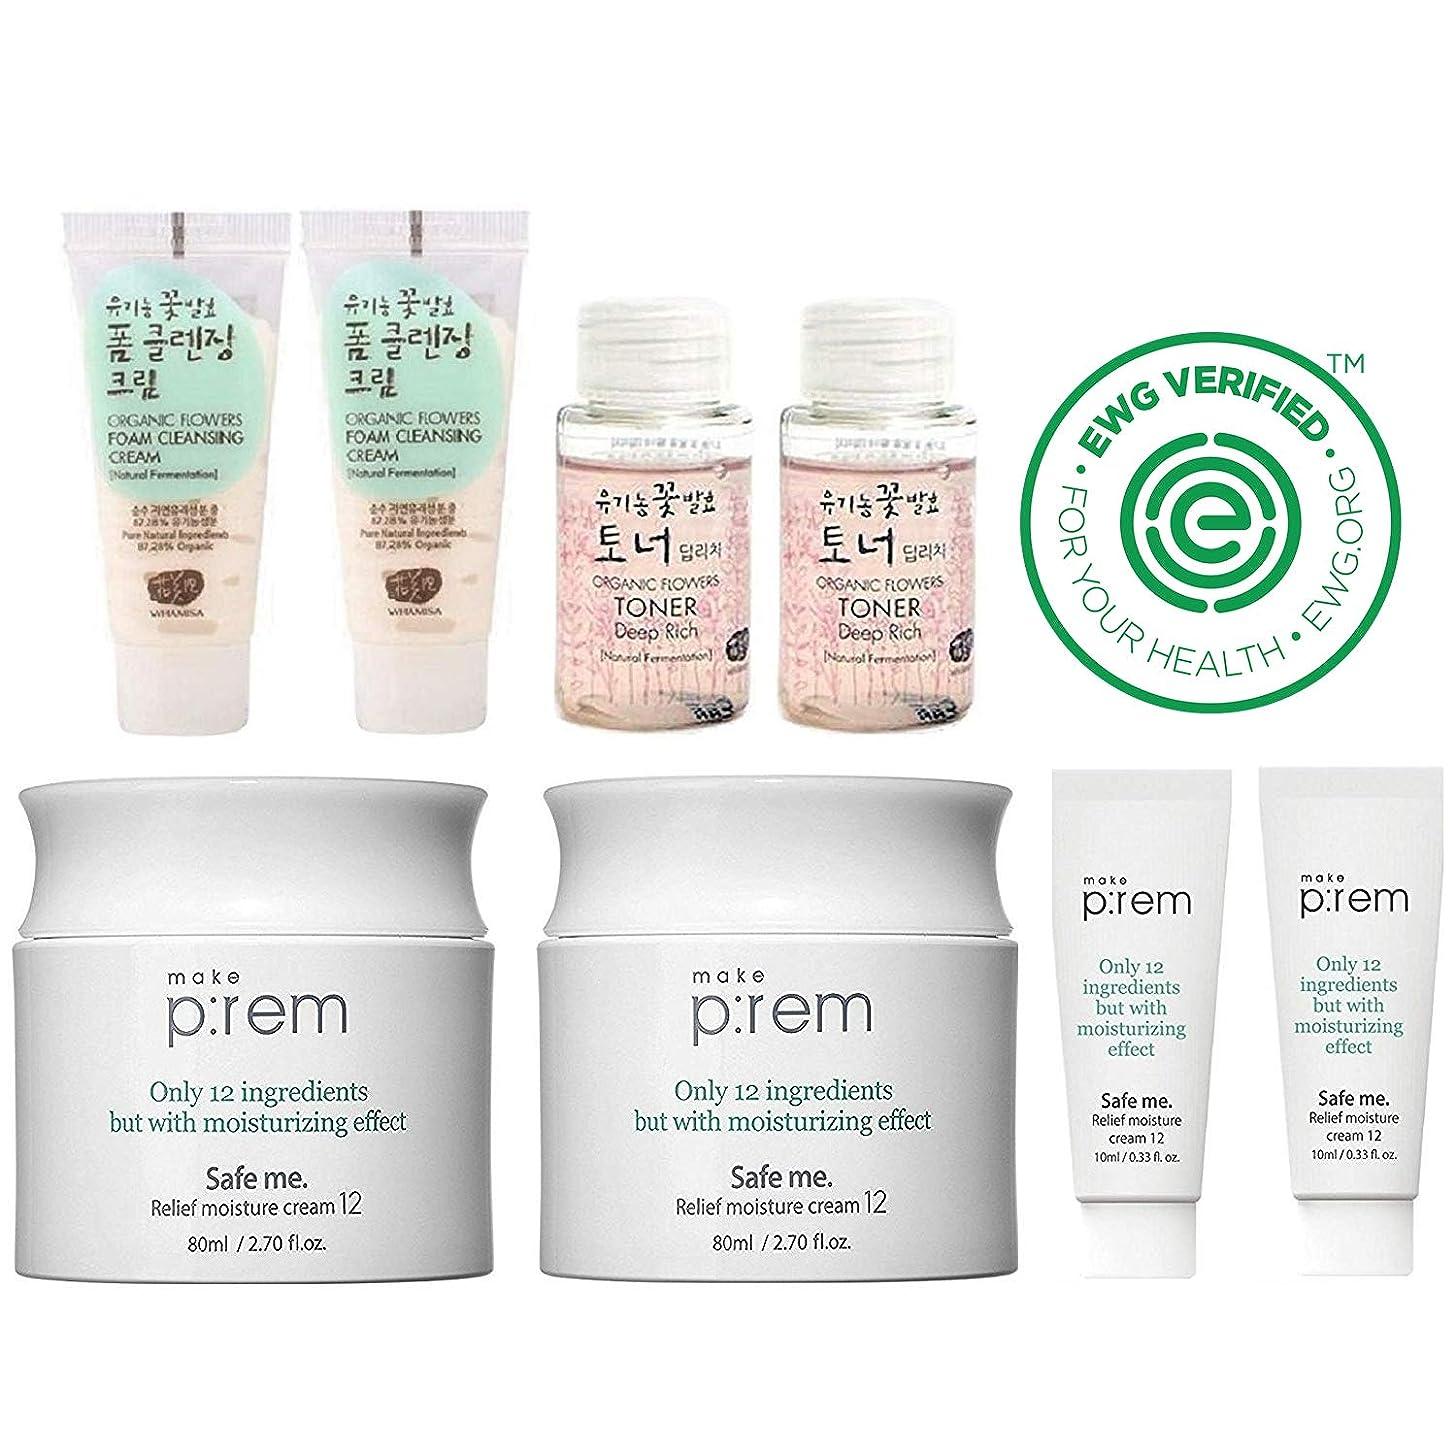 MAKEP:REM Safe Me. Relief Moisture Cream l 80ml x 2 + 20ml & Whamisa Organic Essence Toner 40ml, Foam Cleanser 40ml | Hypoallergenic Day Cream/Night Cream for Sensitive Skin by MAKEPREM MAKE P:REM